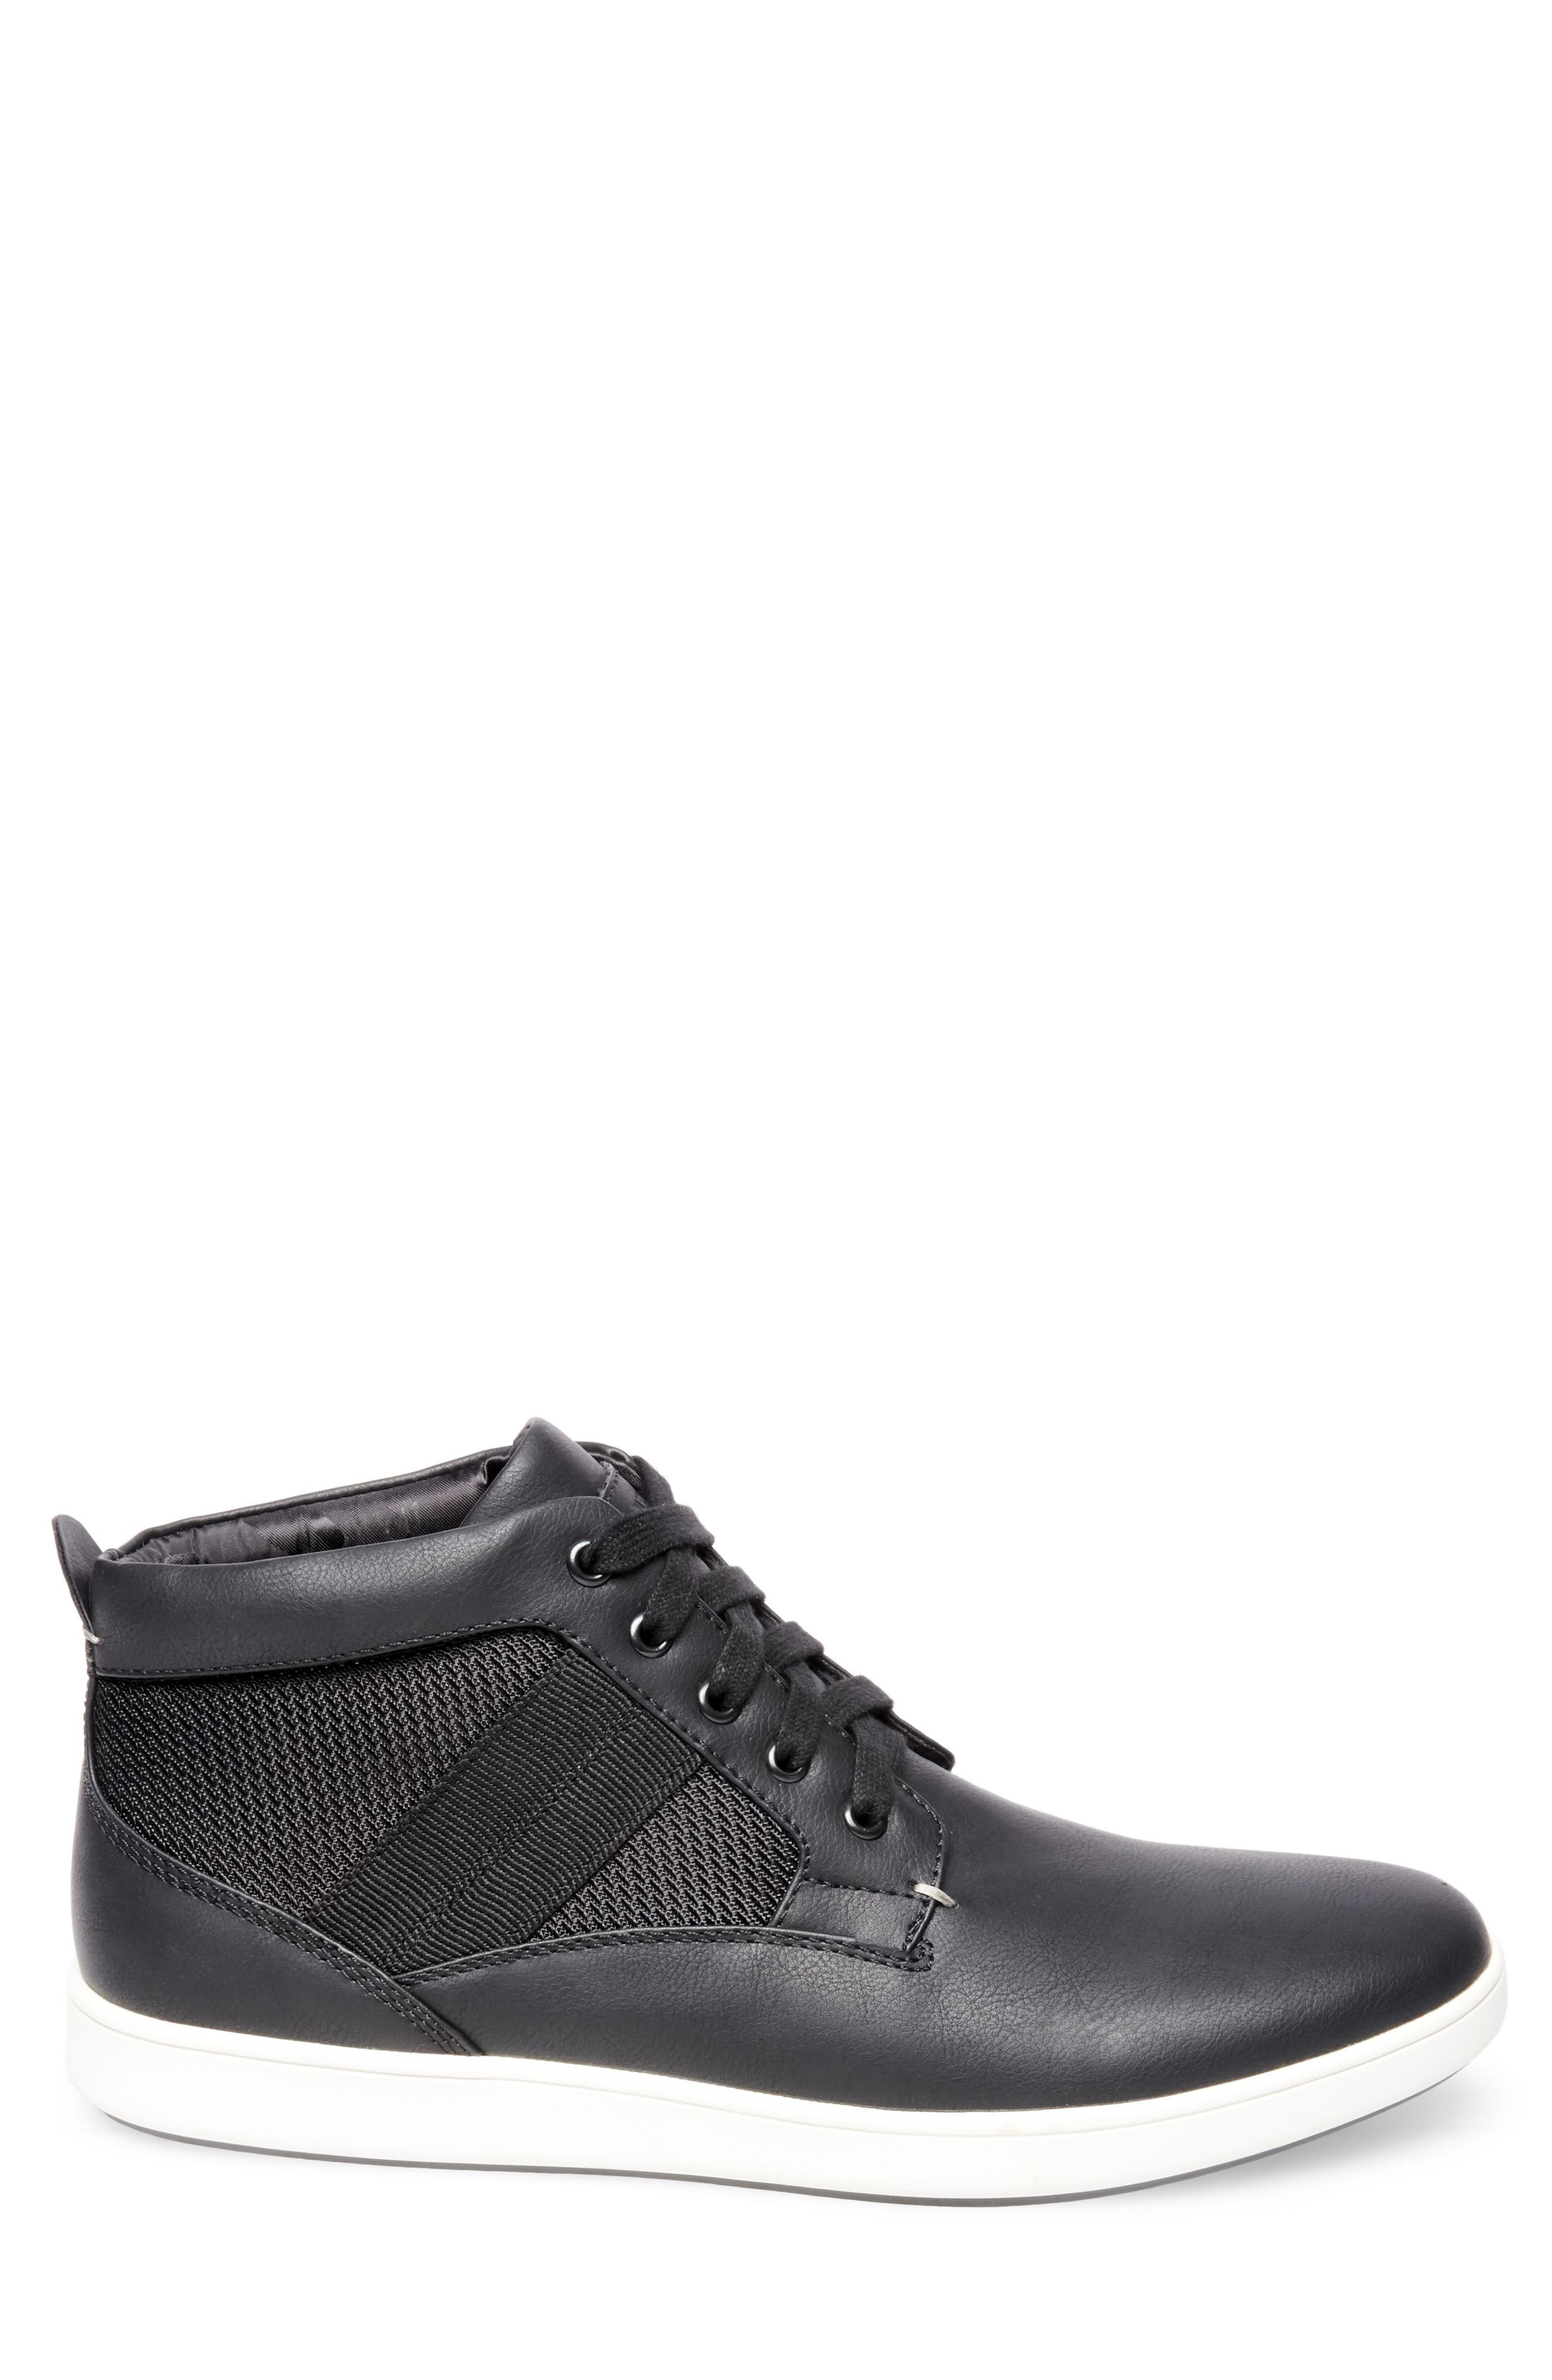 Frazier Sneaker Boot,                             Alternate thumbnail 3, color,                             007